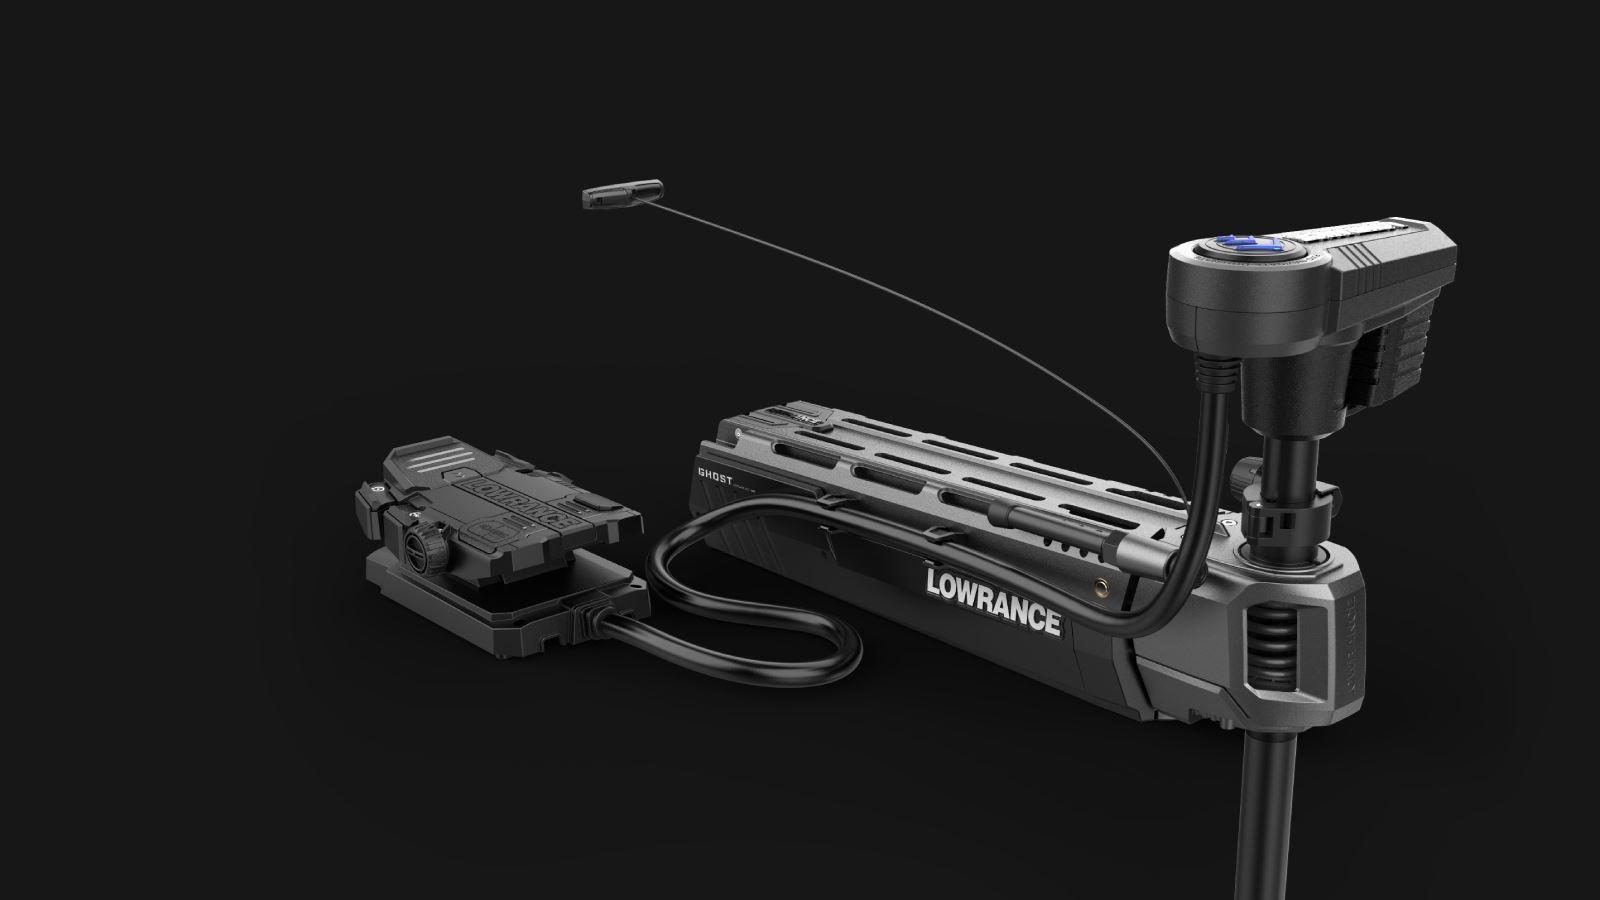 Lowrance Marine & Fishing Electronics | USA